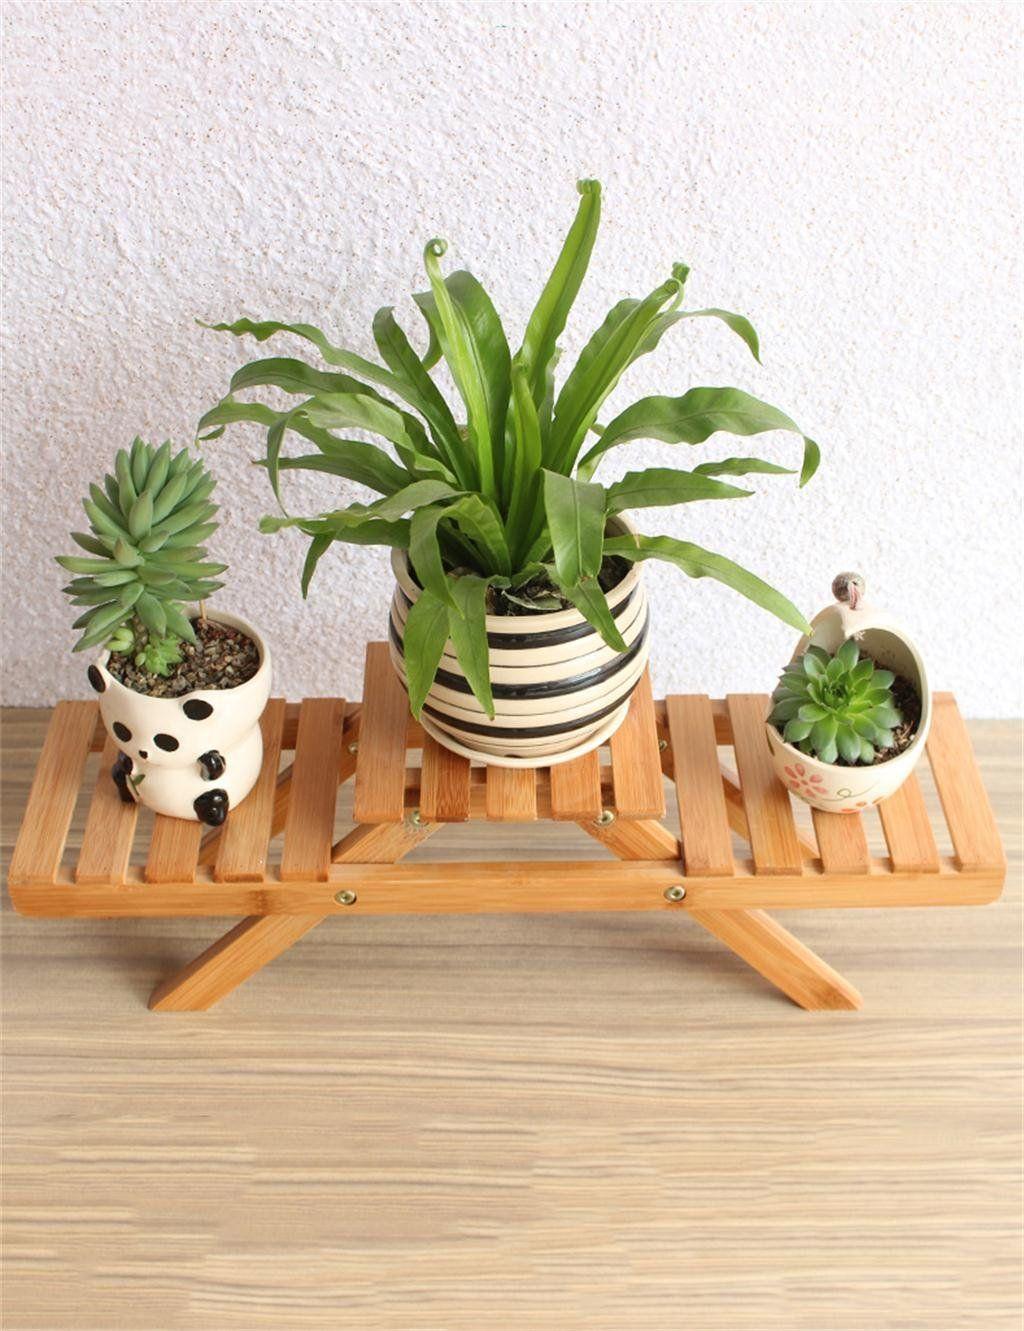 CAIJUN Blumenständer Bambus Tisch Blumen Topf Regal Succulents Pflanze